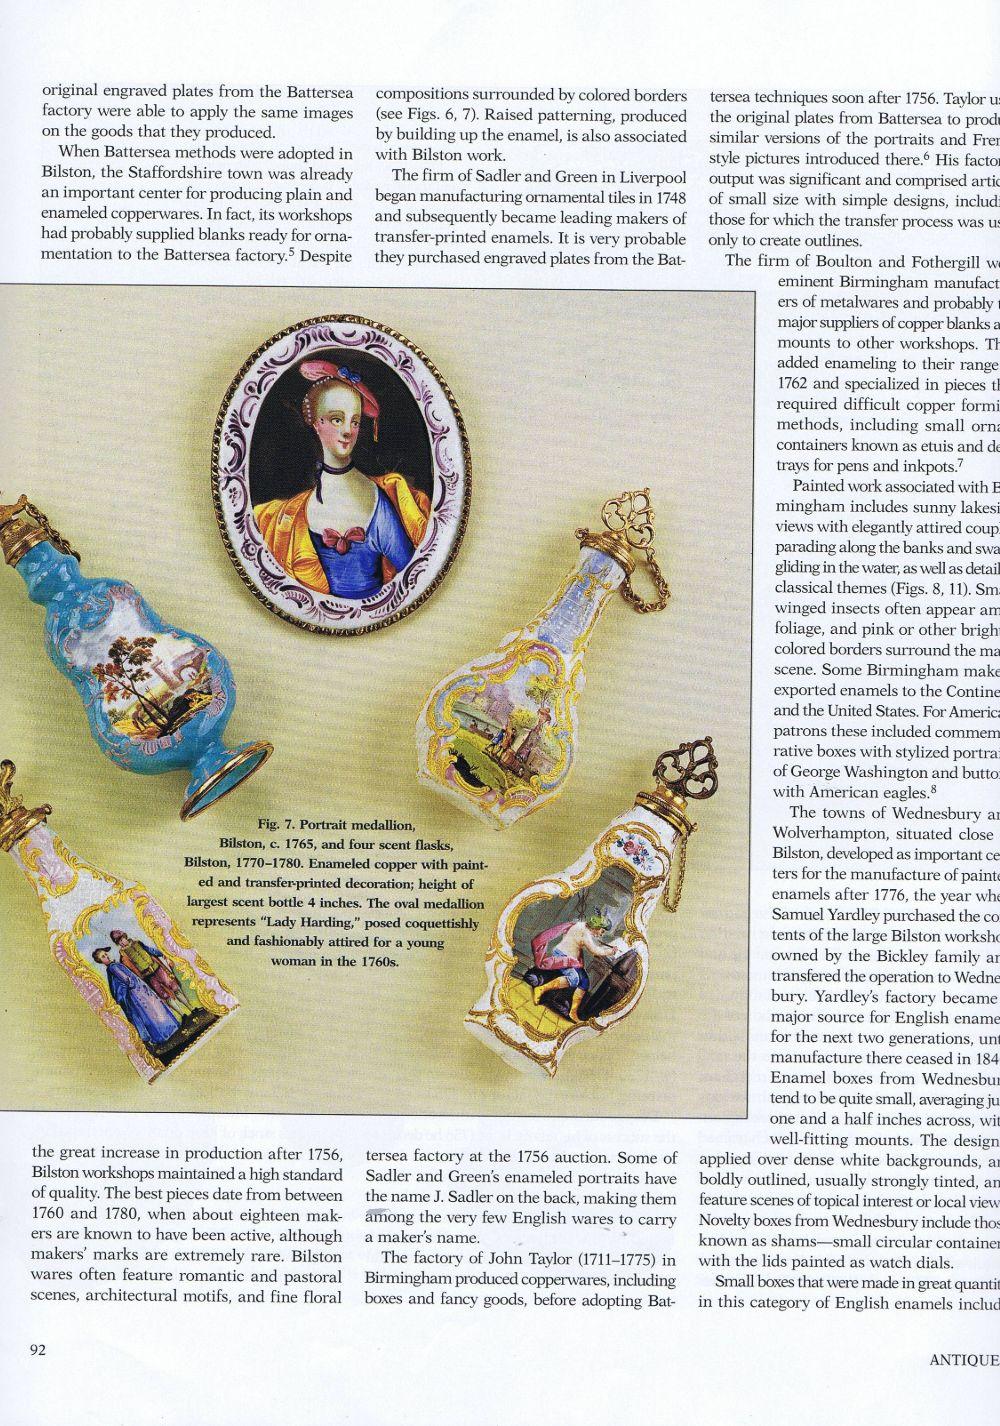 the magazine antiques07 June 2007.5